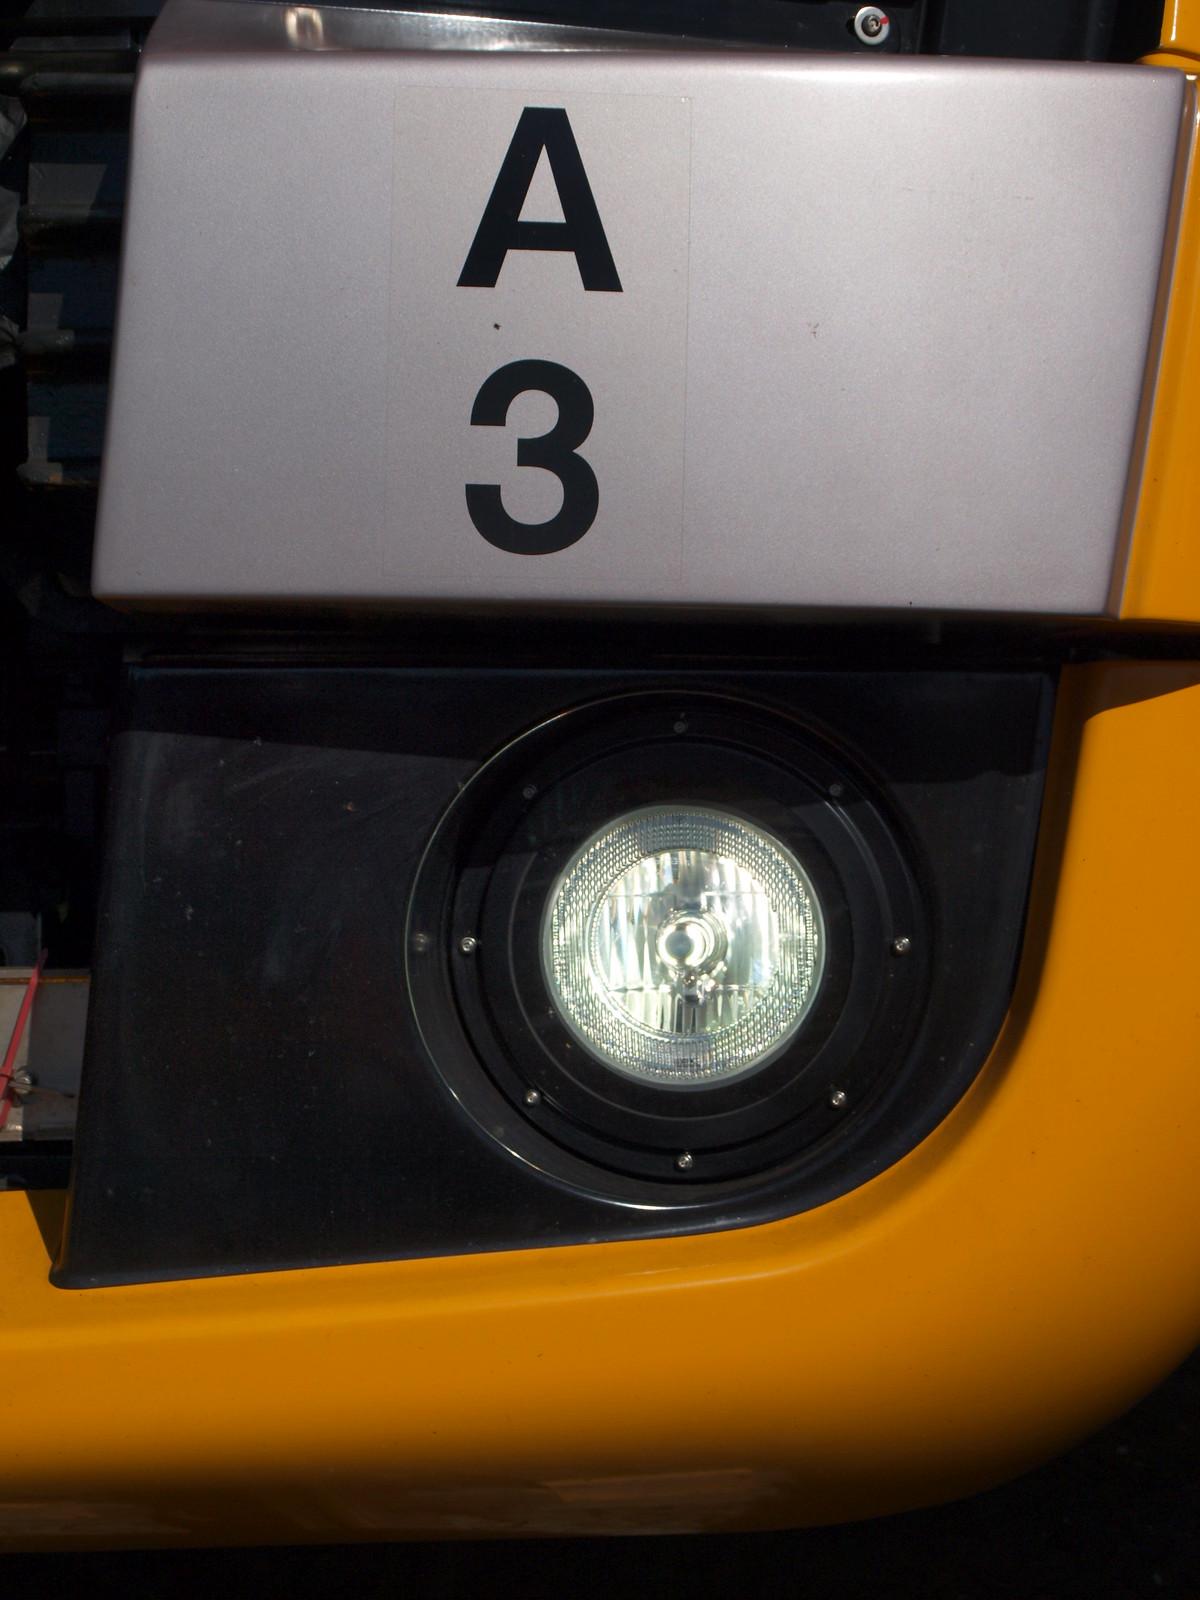 CityRail's new Waratah Train or A Set - A3 by T G